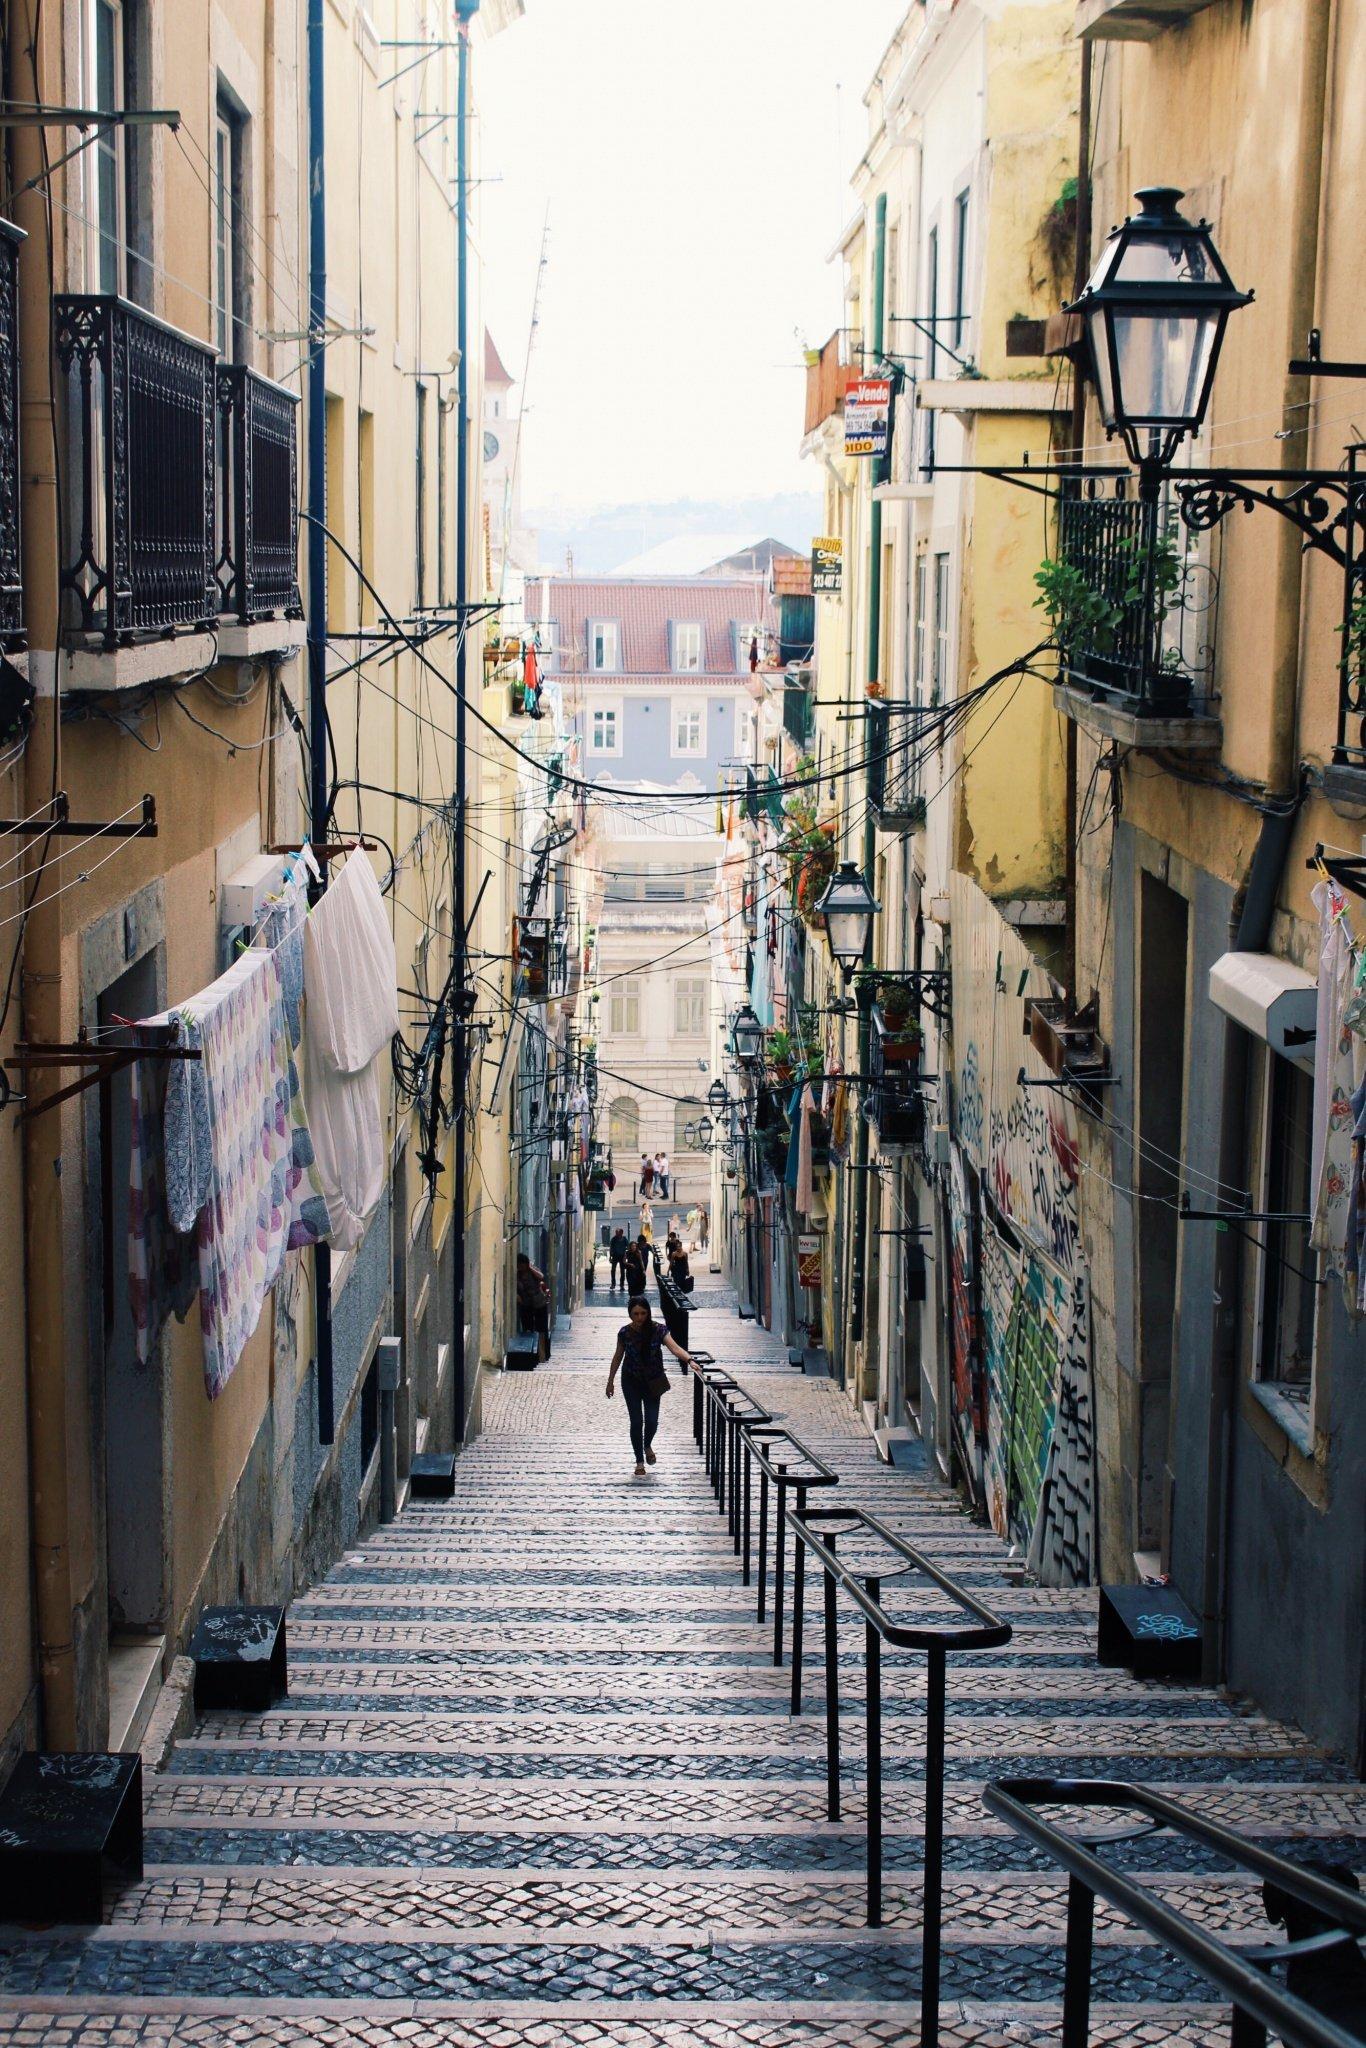 Bairro alto in in Lisbon, Porugal